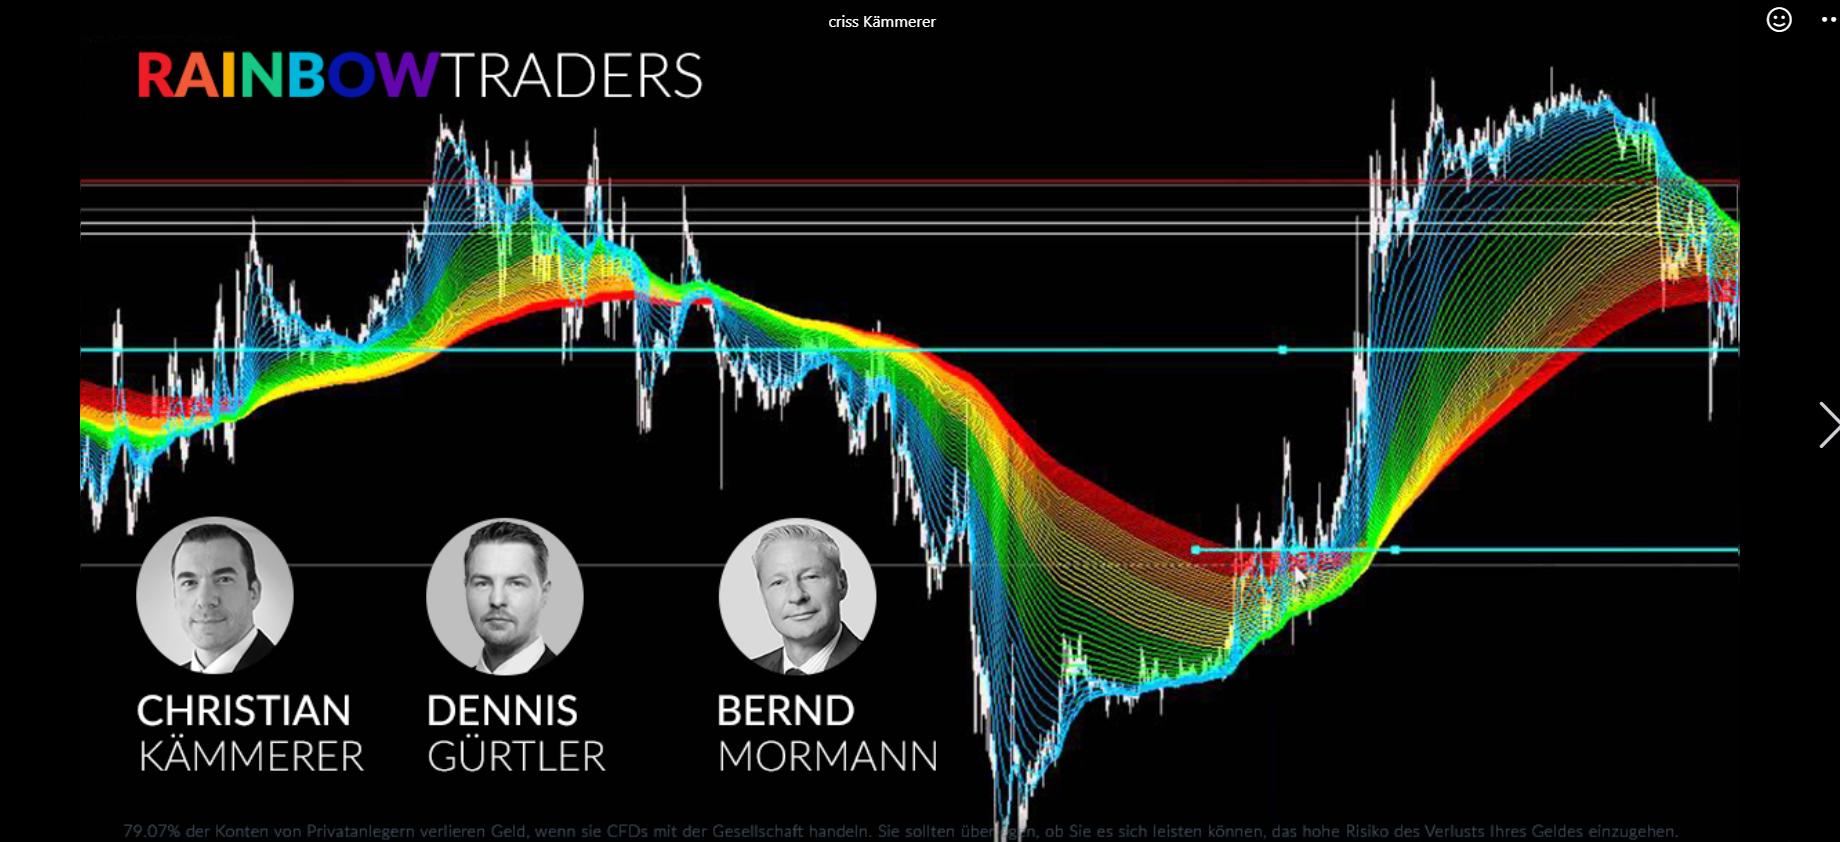 BRENT-ÖL-im-Rainbow-Check-Chartanalyse-JFD-Bank-GodmodeTrader.de-2